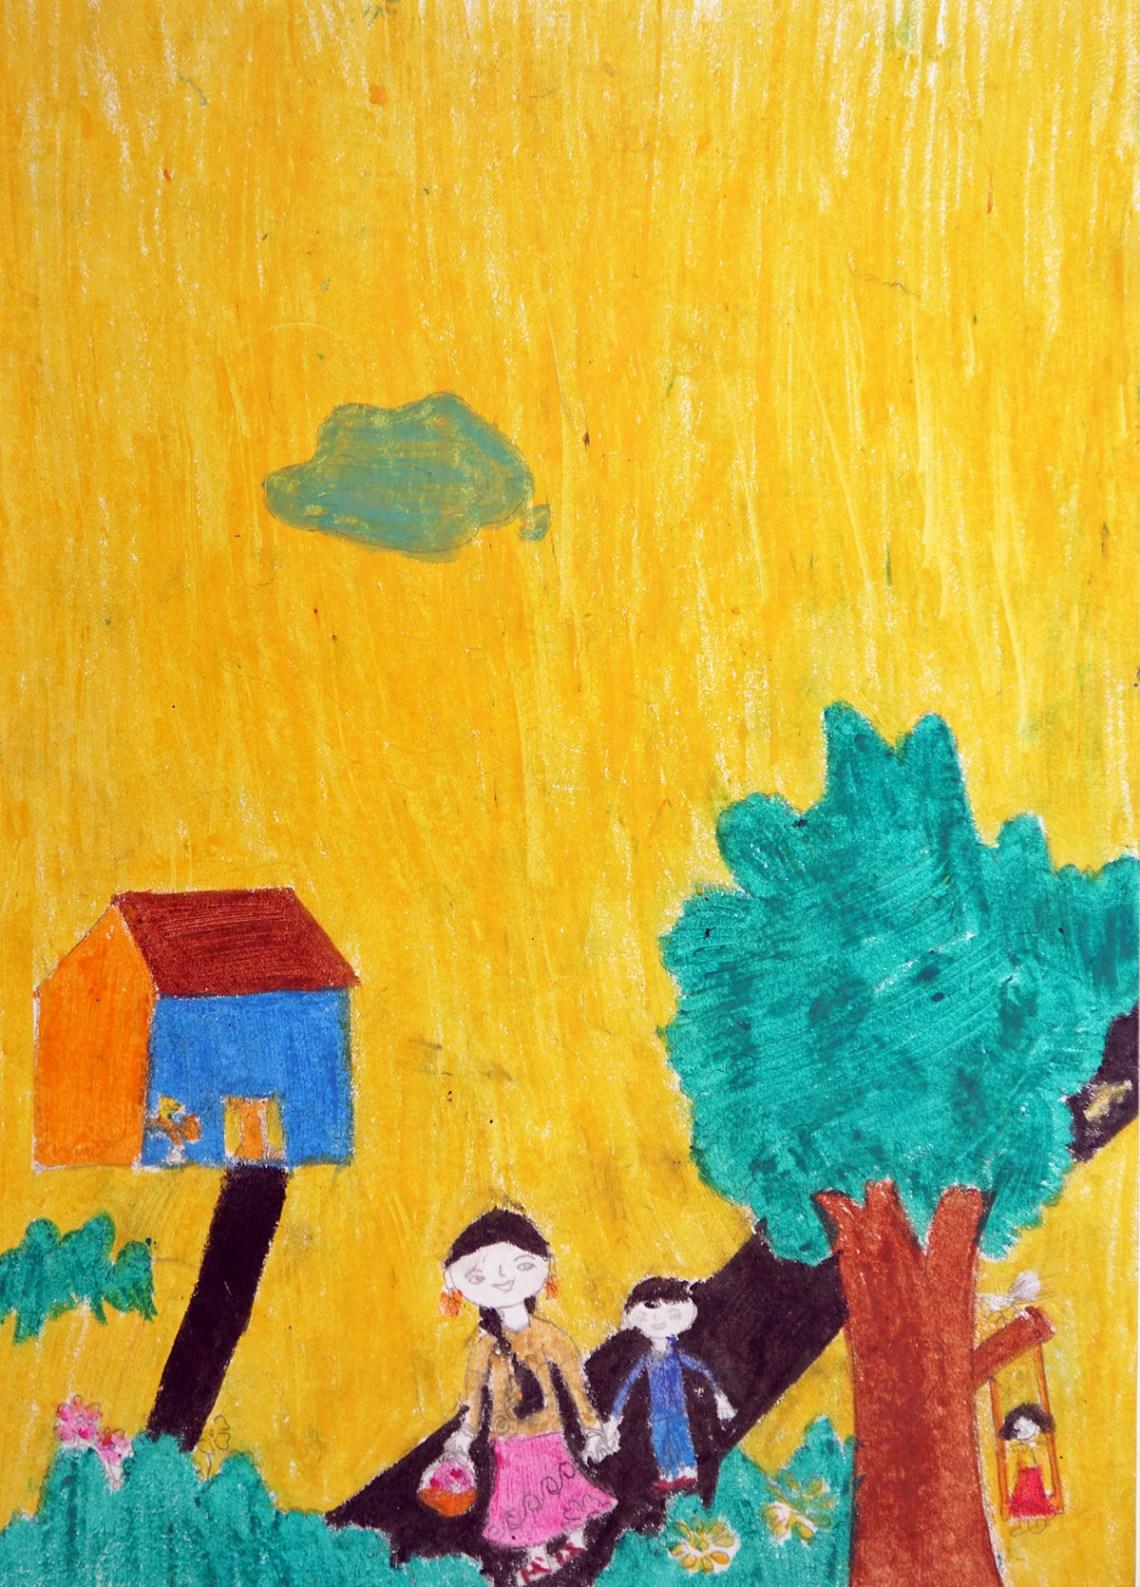 Painting by Kajal Baraf, gold medal winning artwork from Khula Aasmaan kids art competition